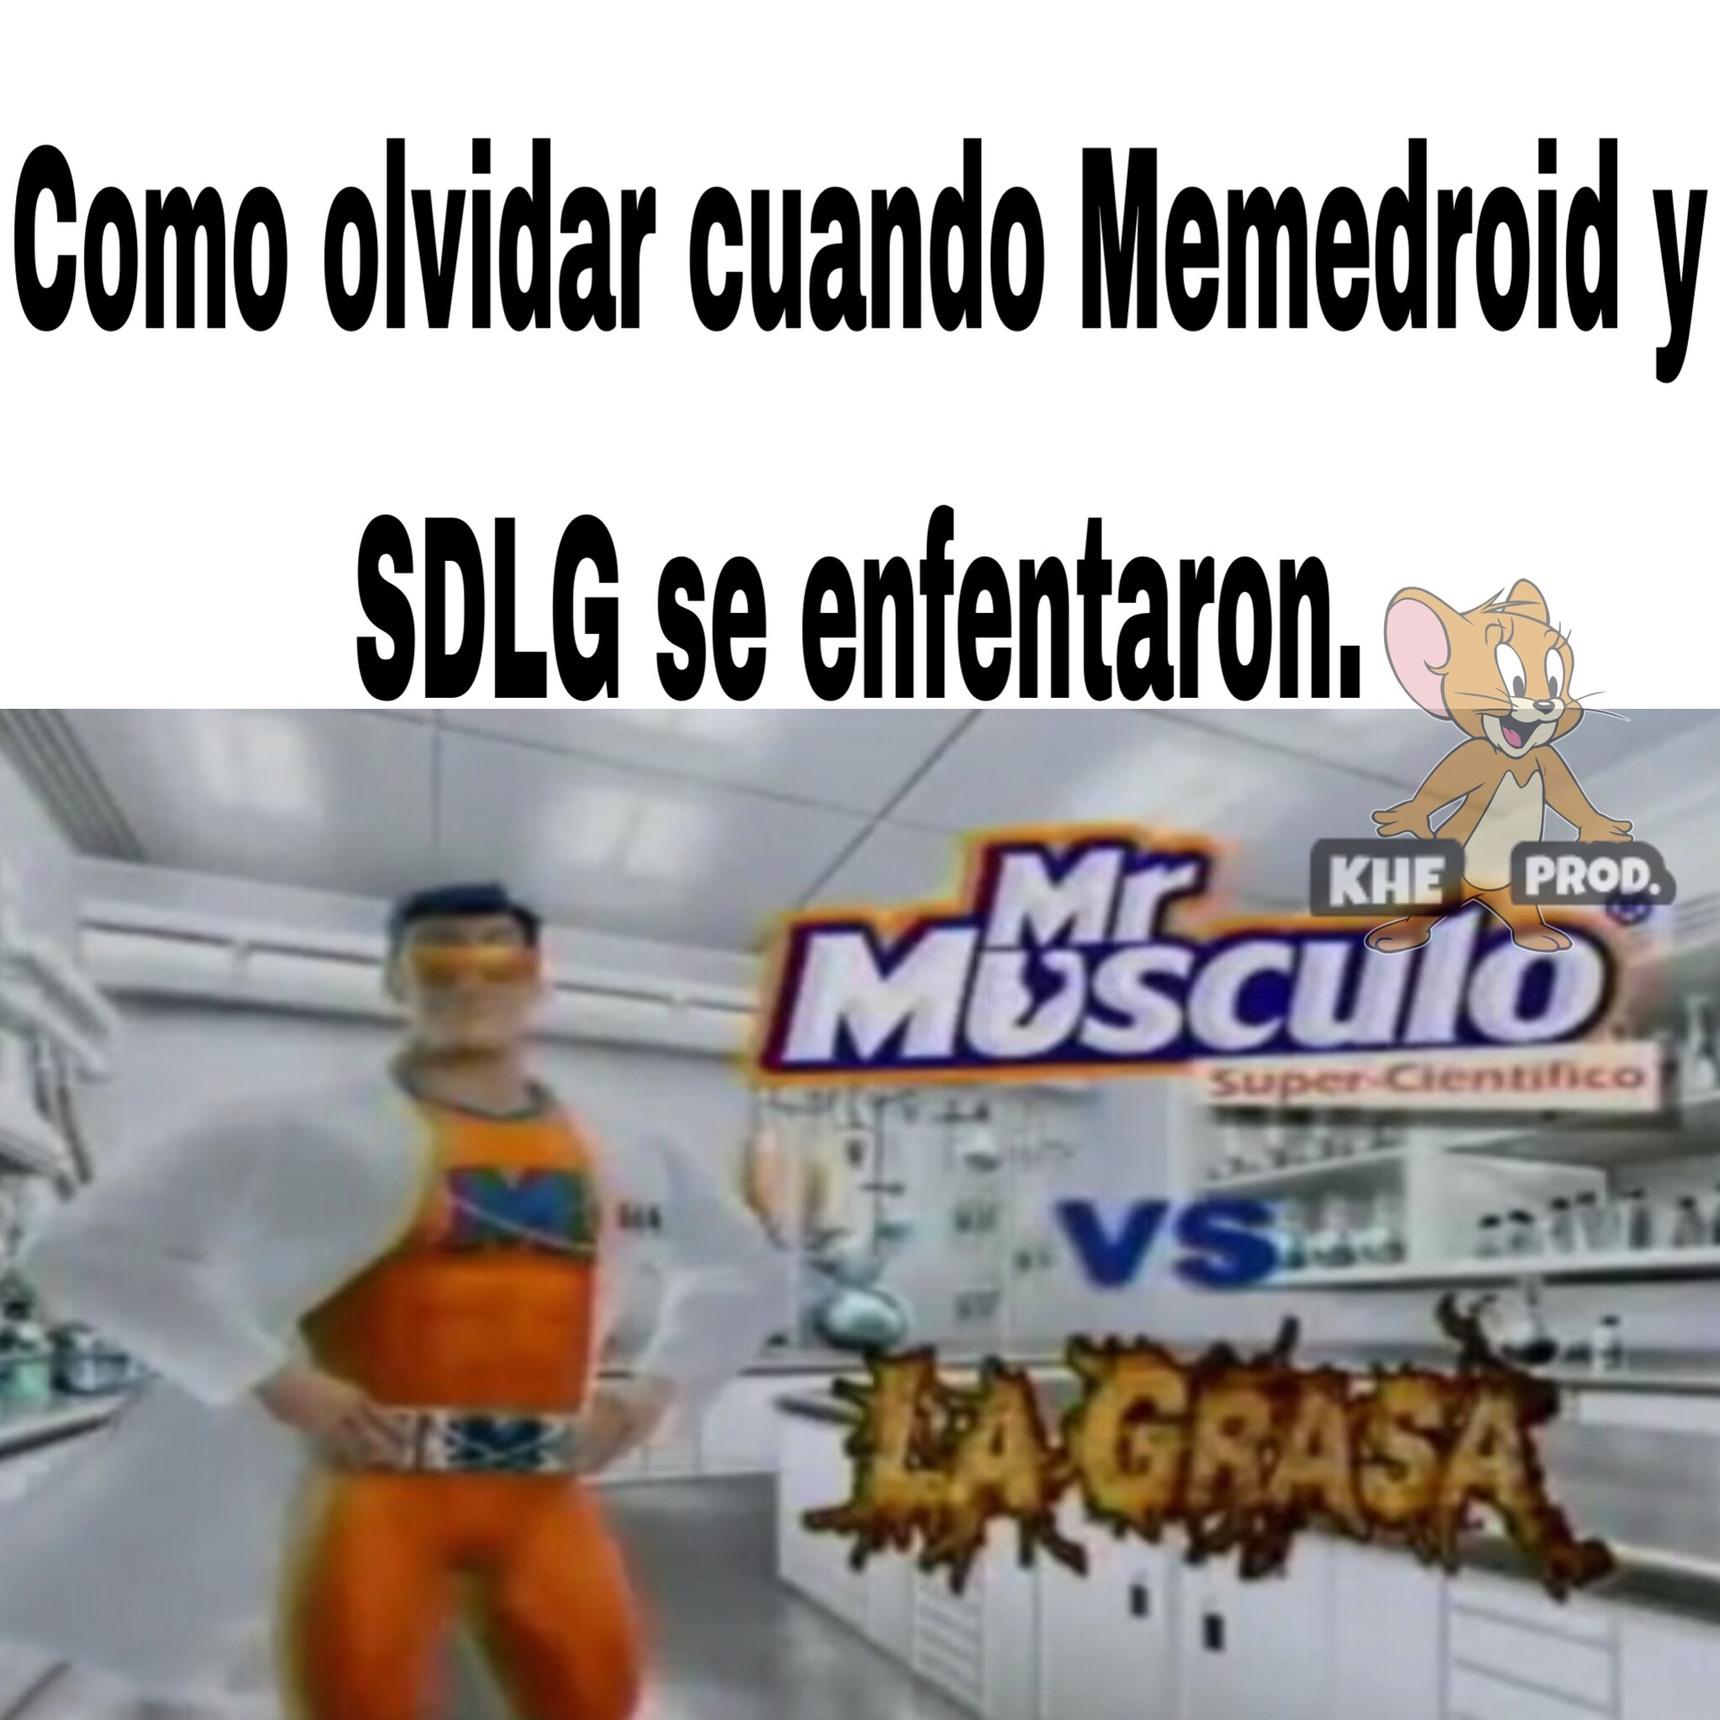 No a la grasa :^) - meme